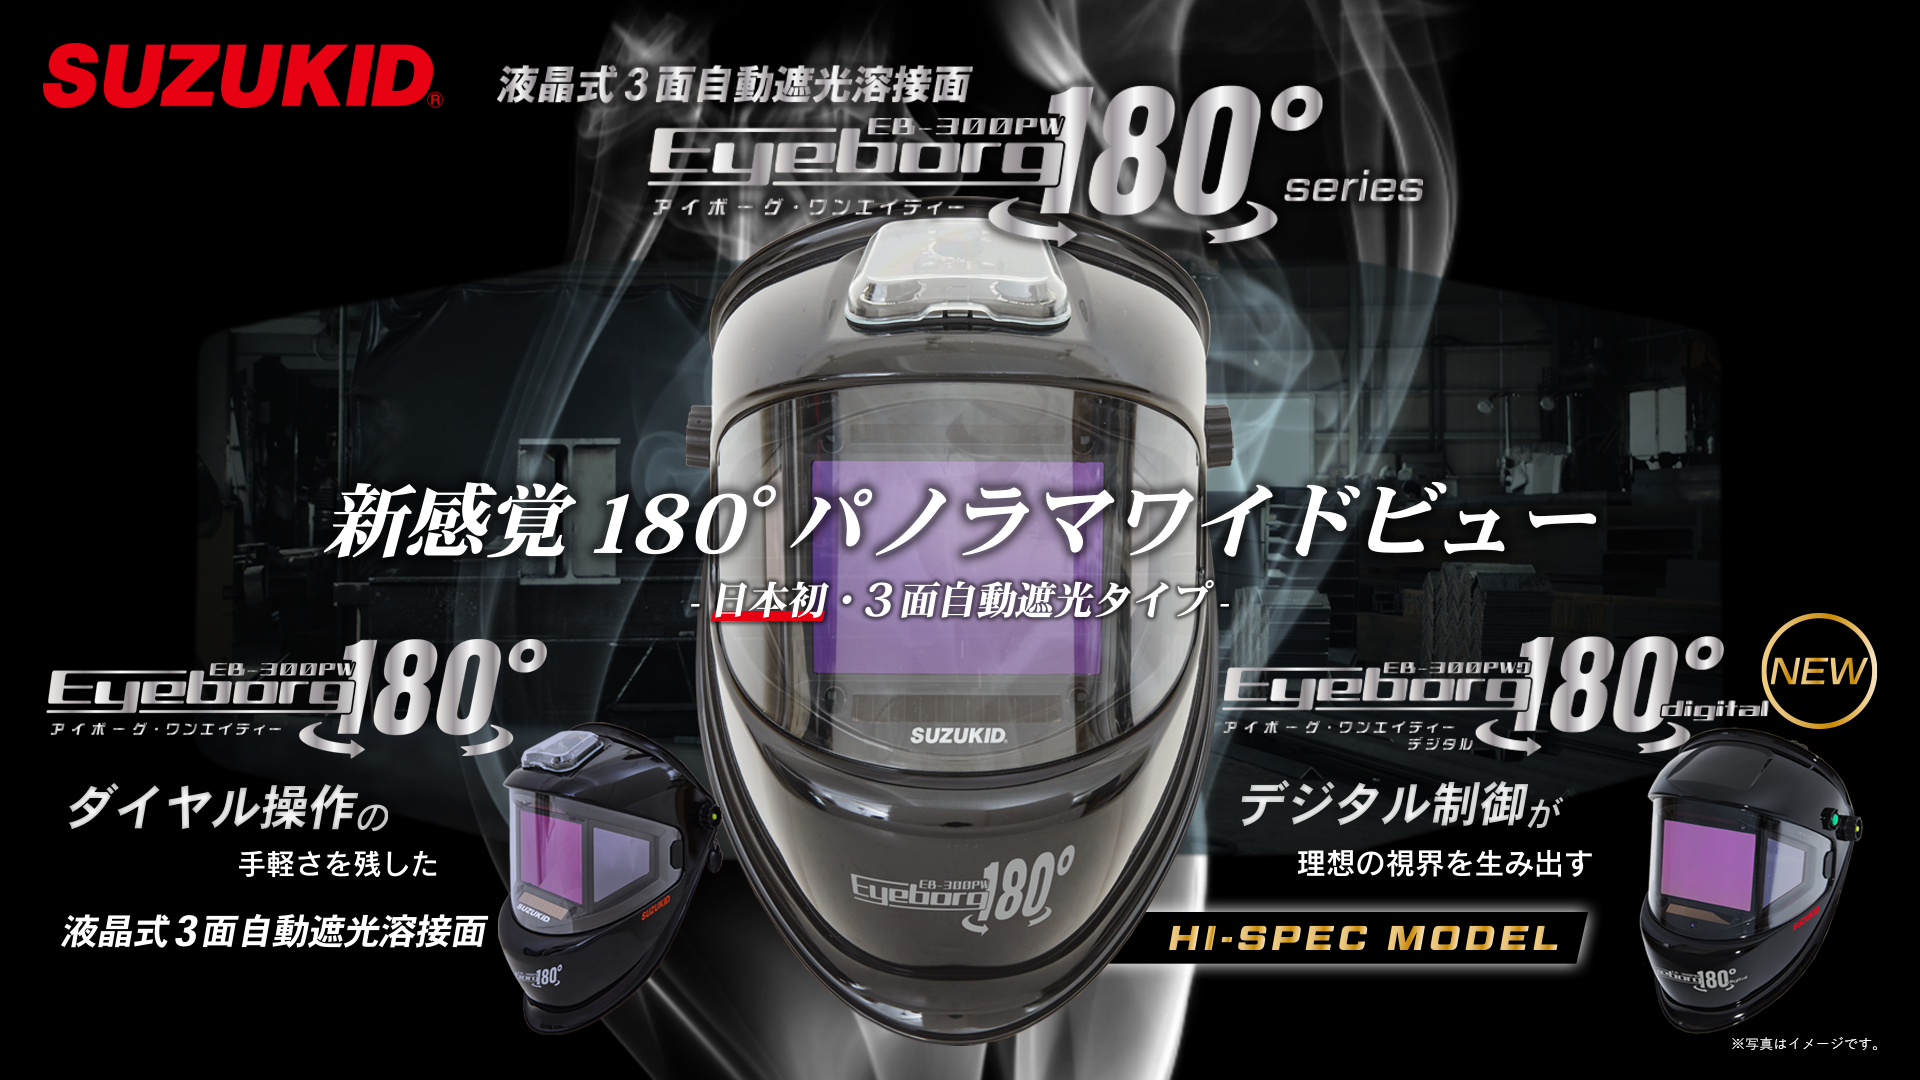 EB300PWD紹介